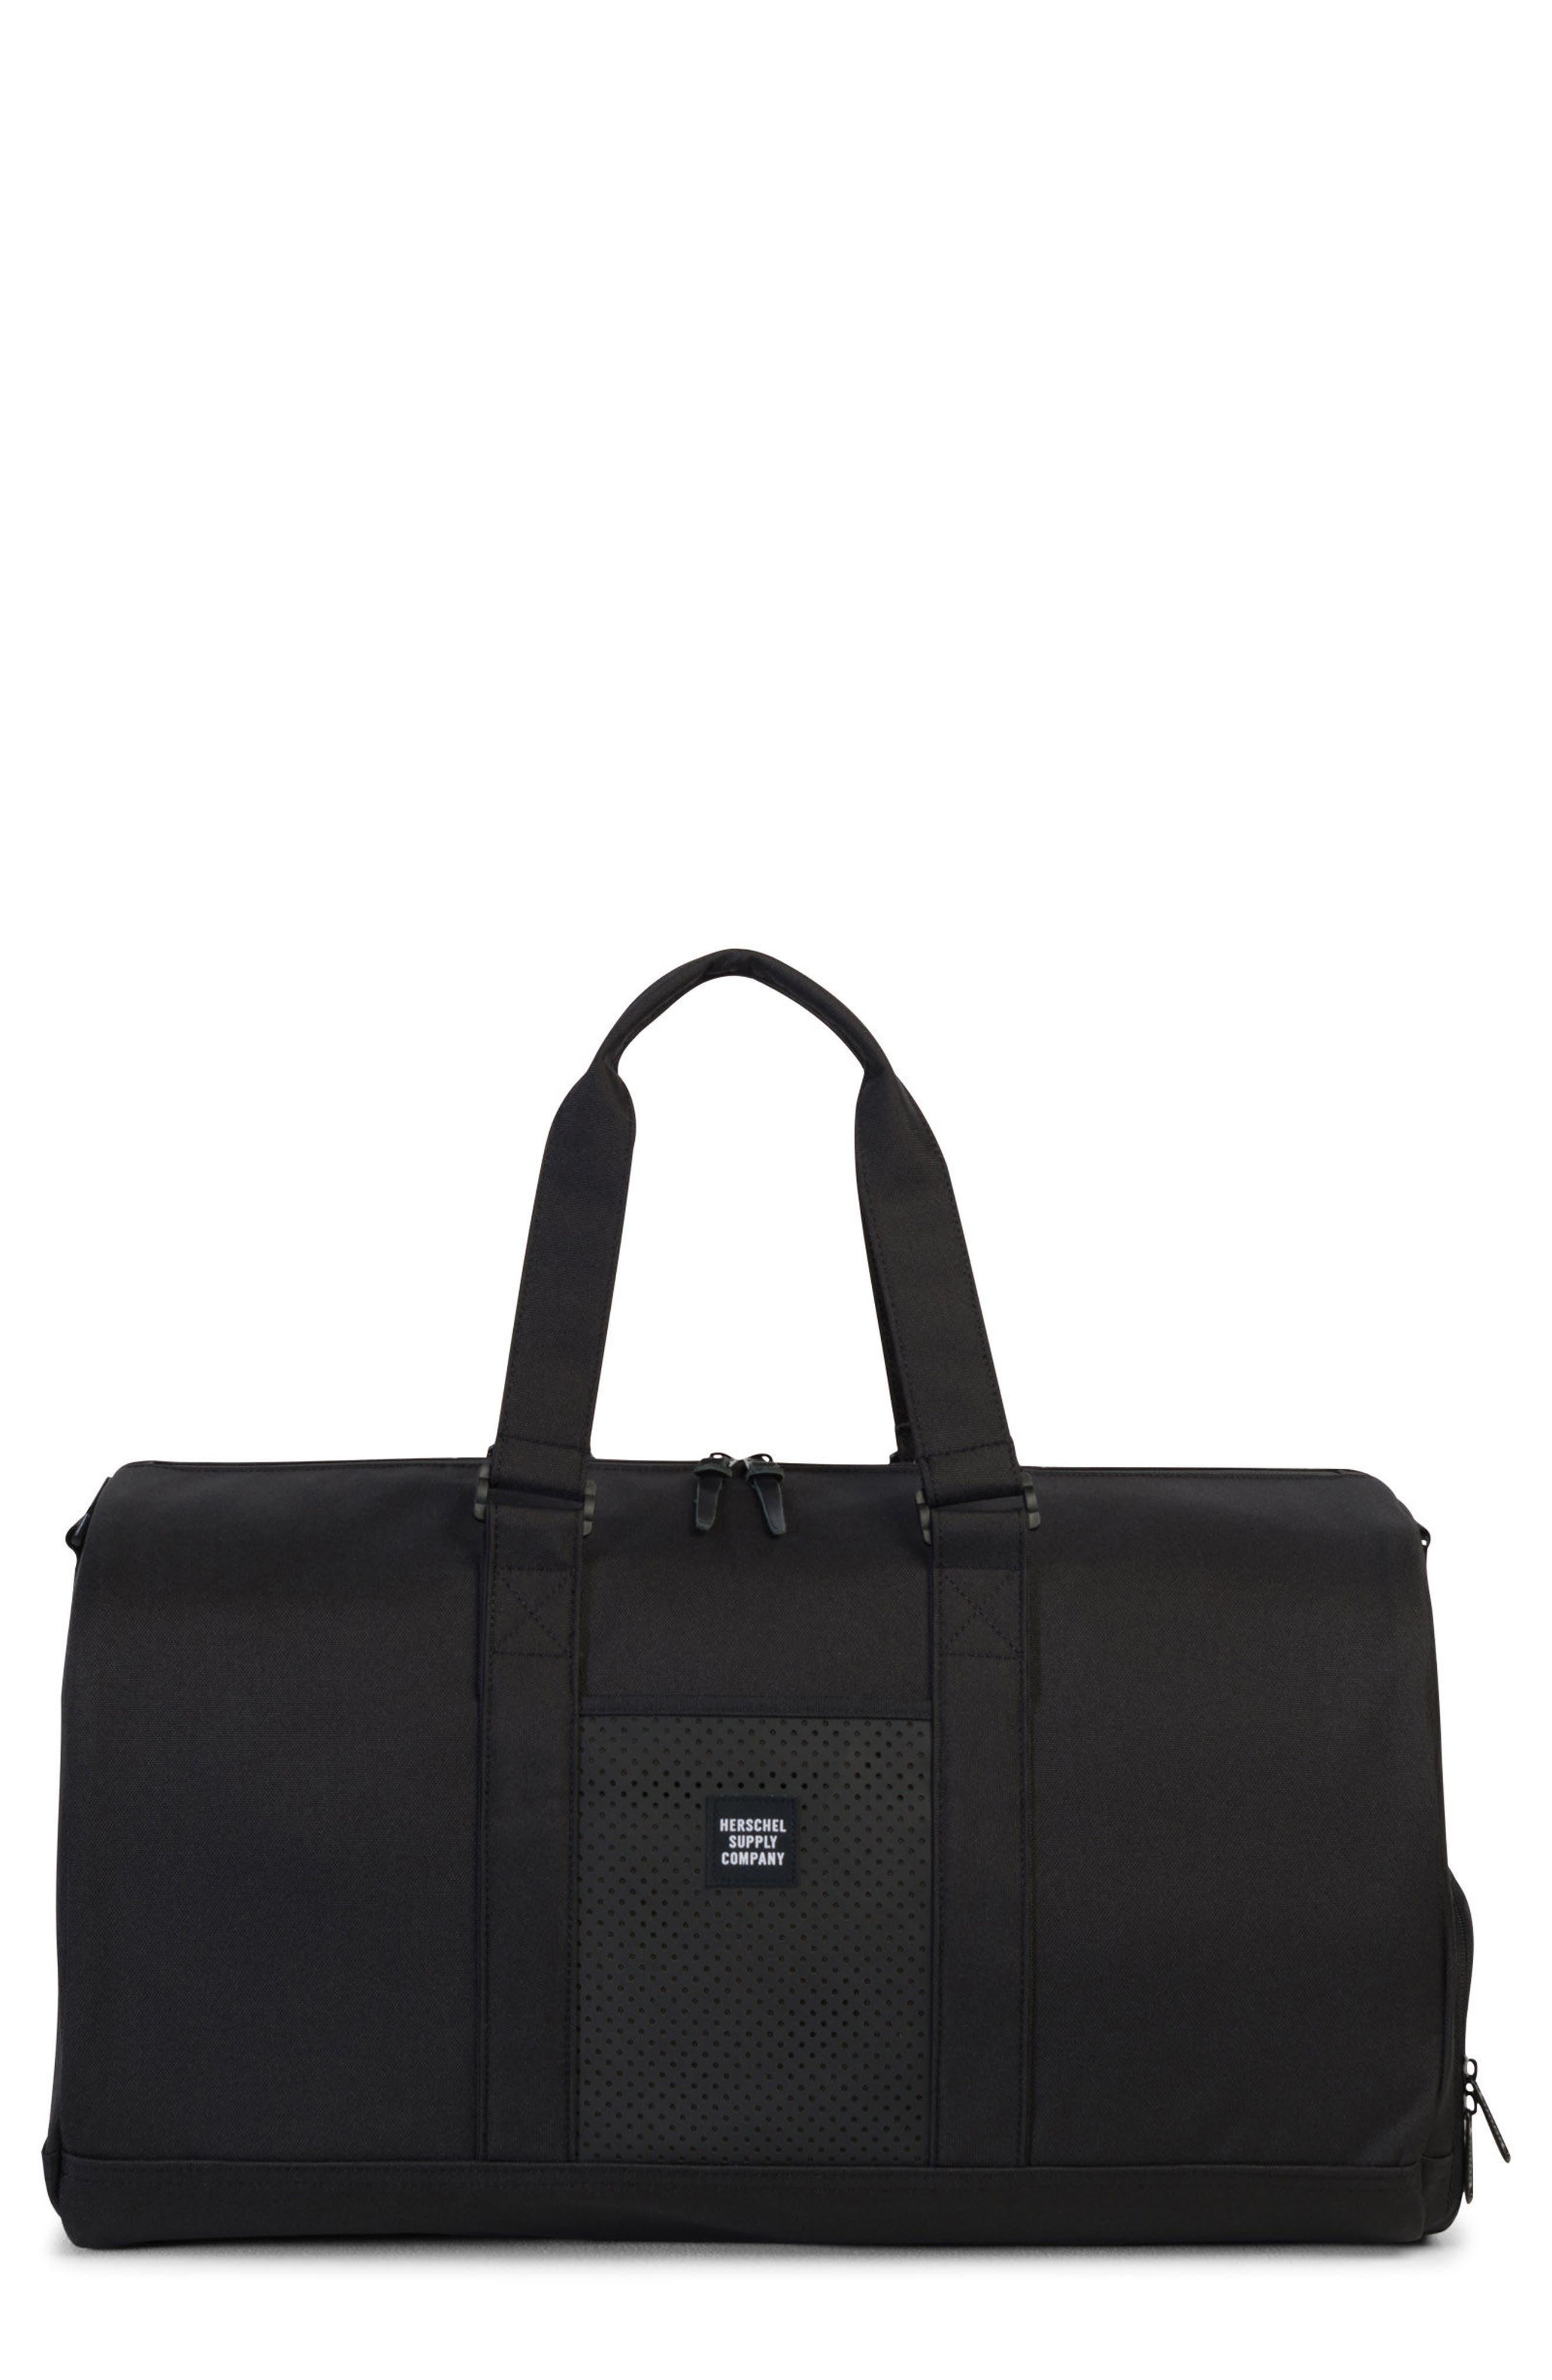 'Novel - Aspect' Duffel Bag,                         Main,                         color, 001